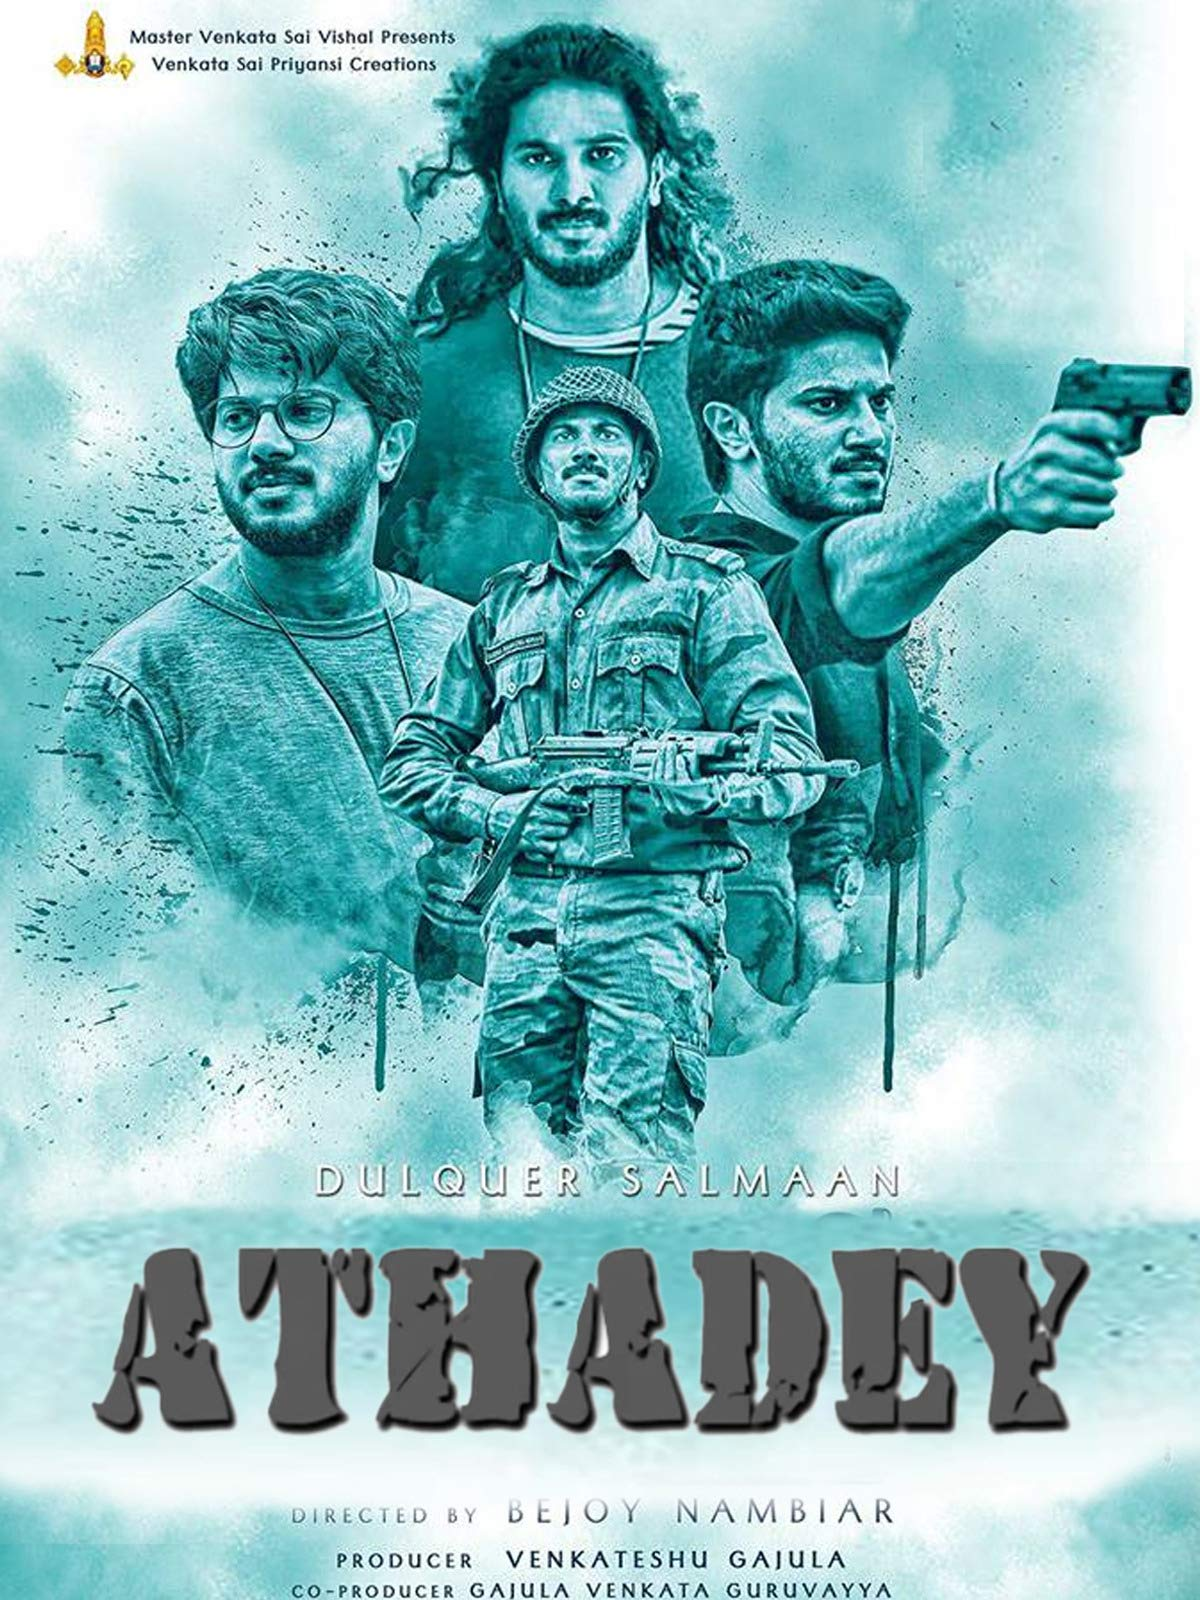 Athadey